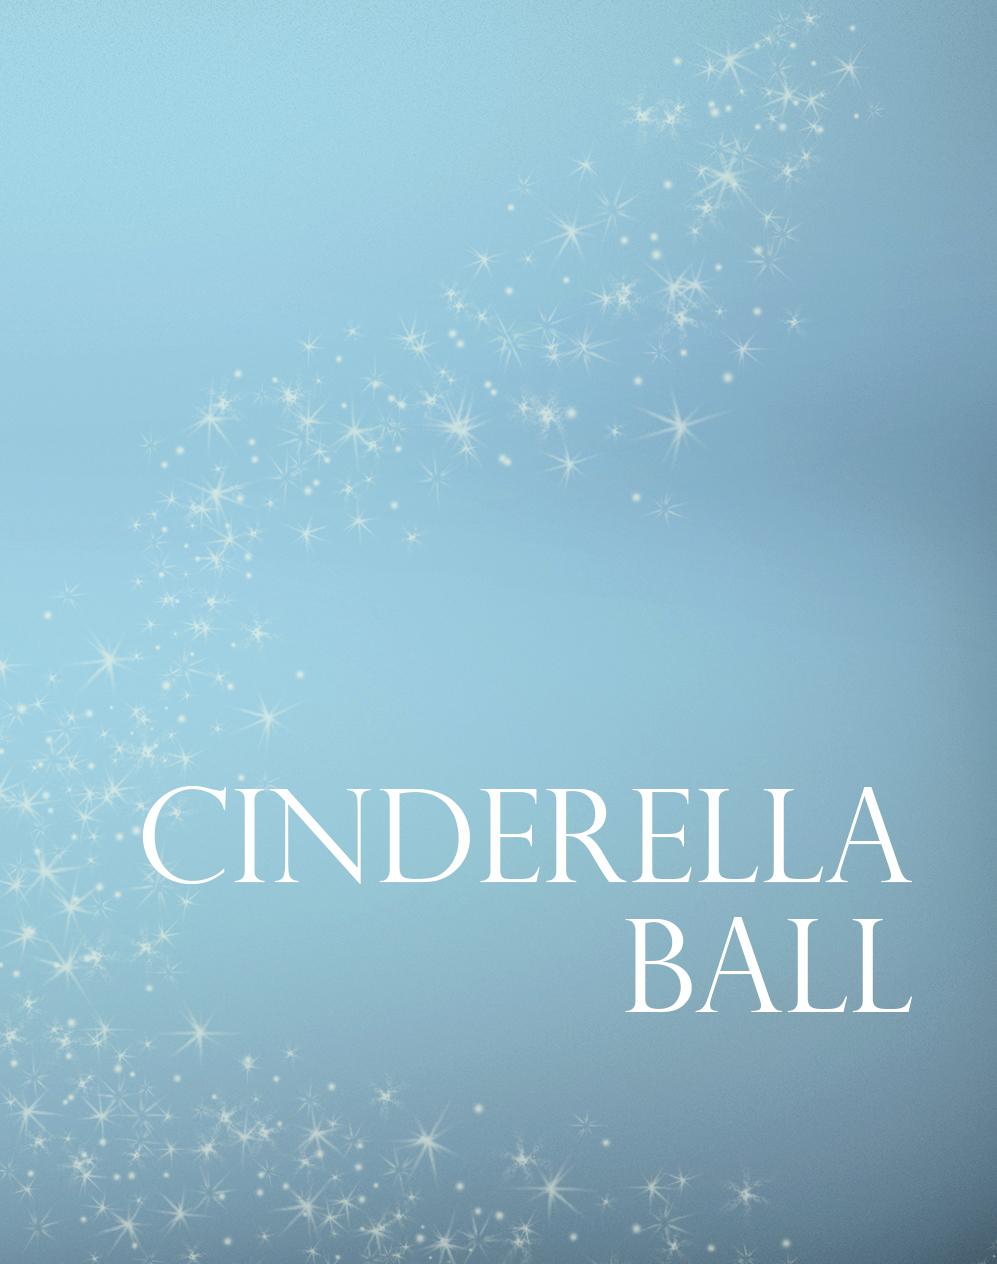 Cinderella Ball